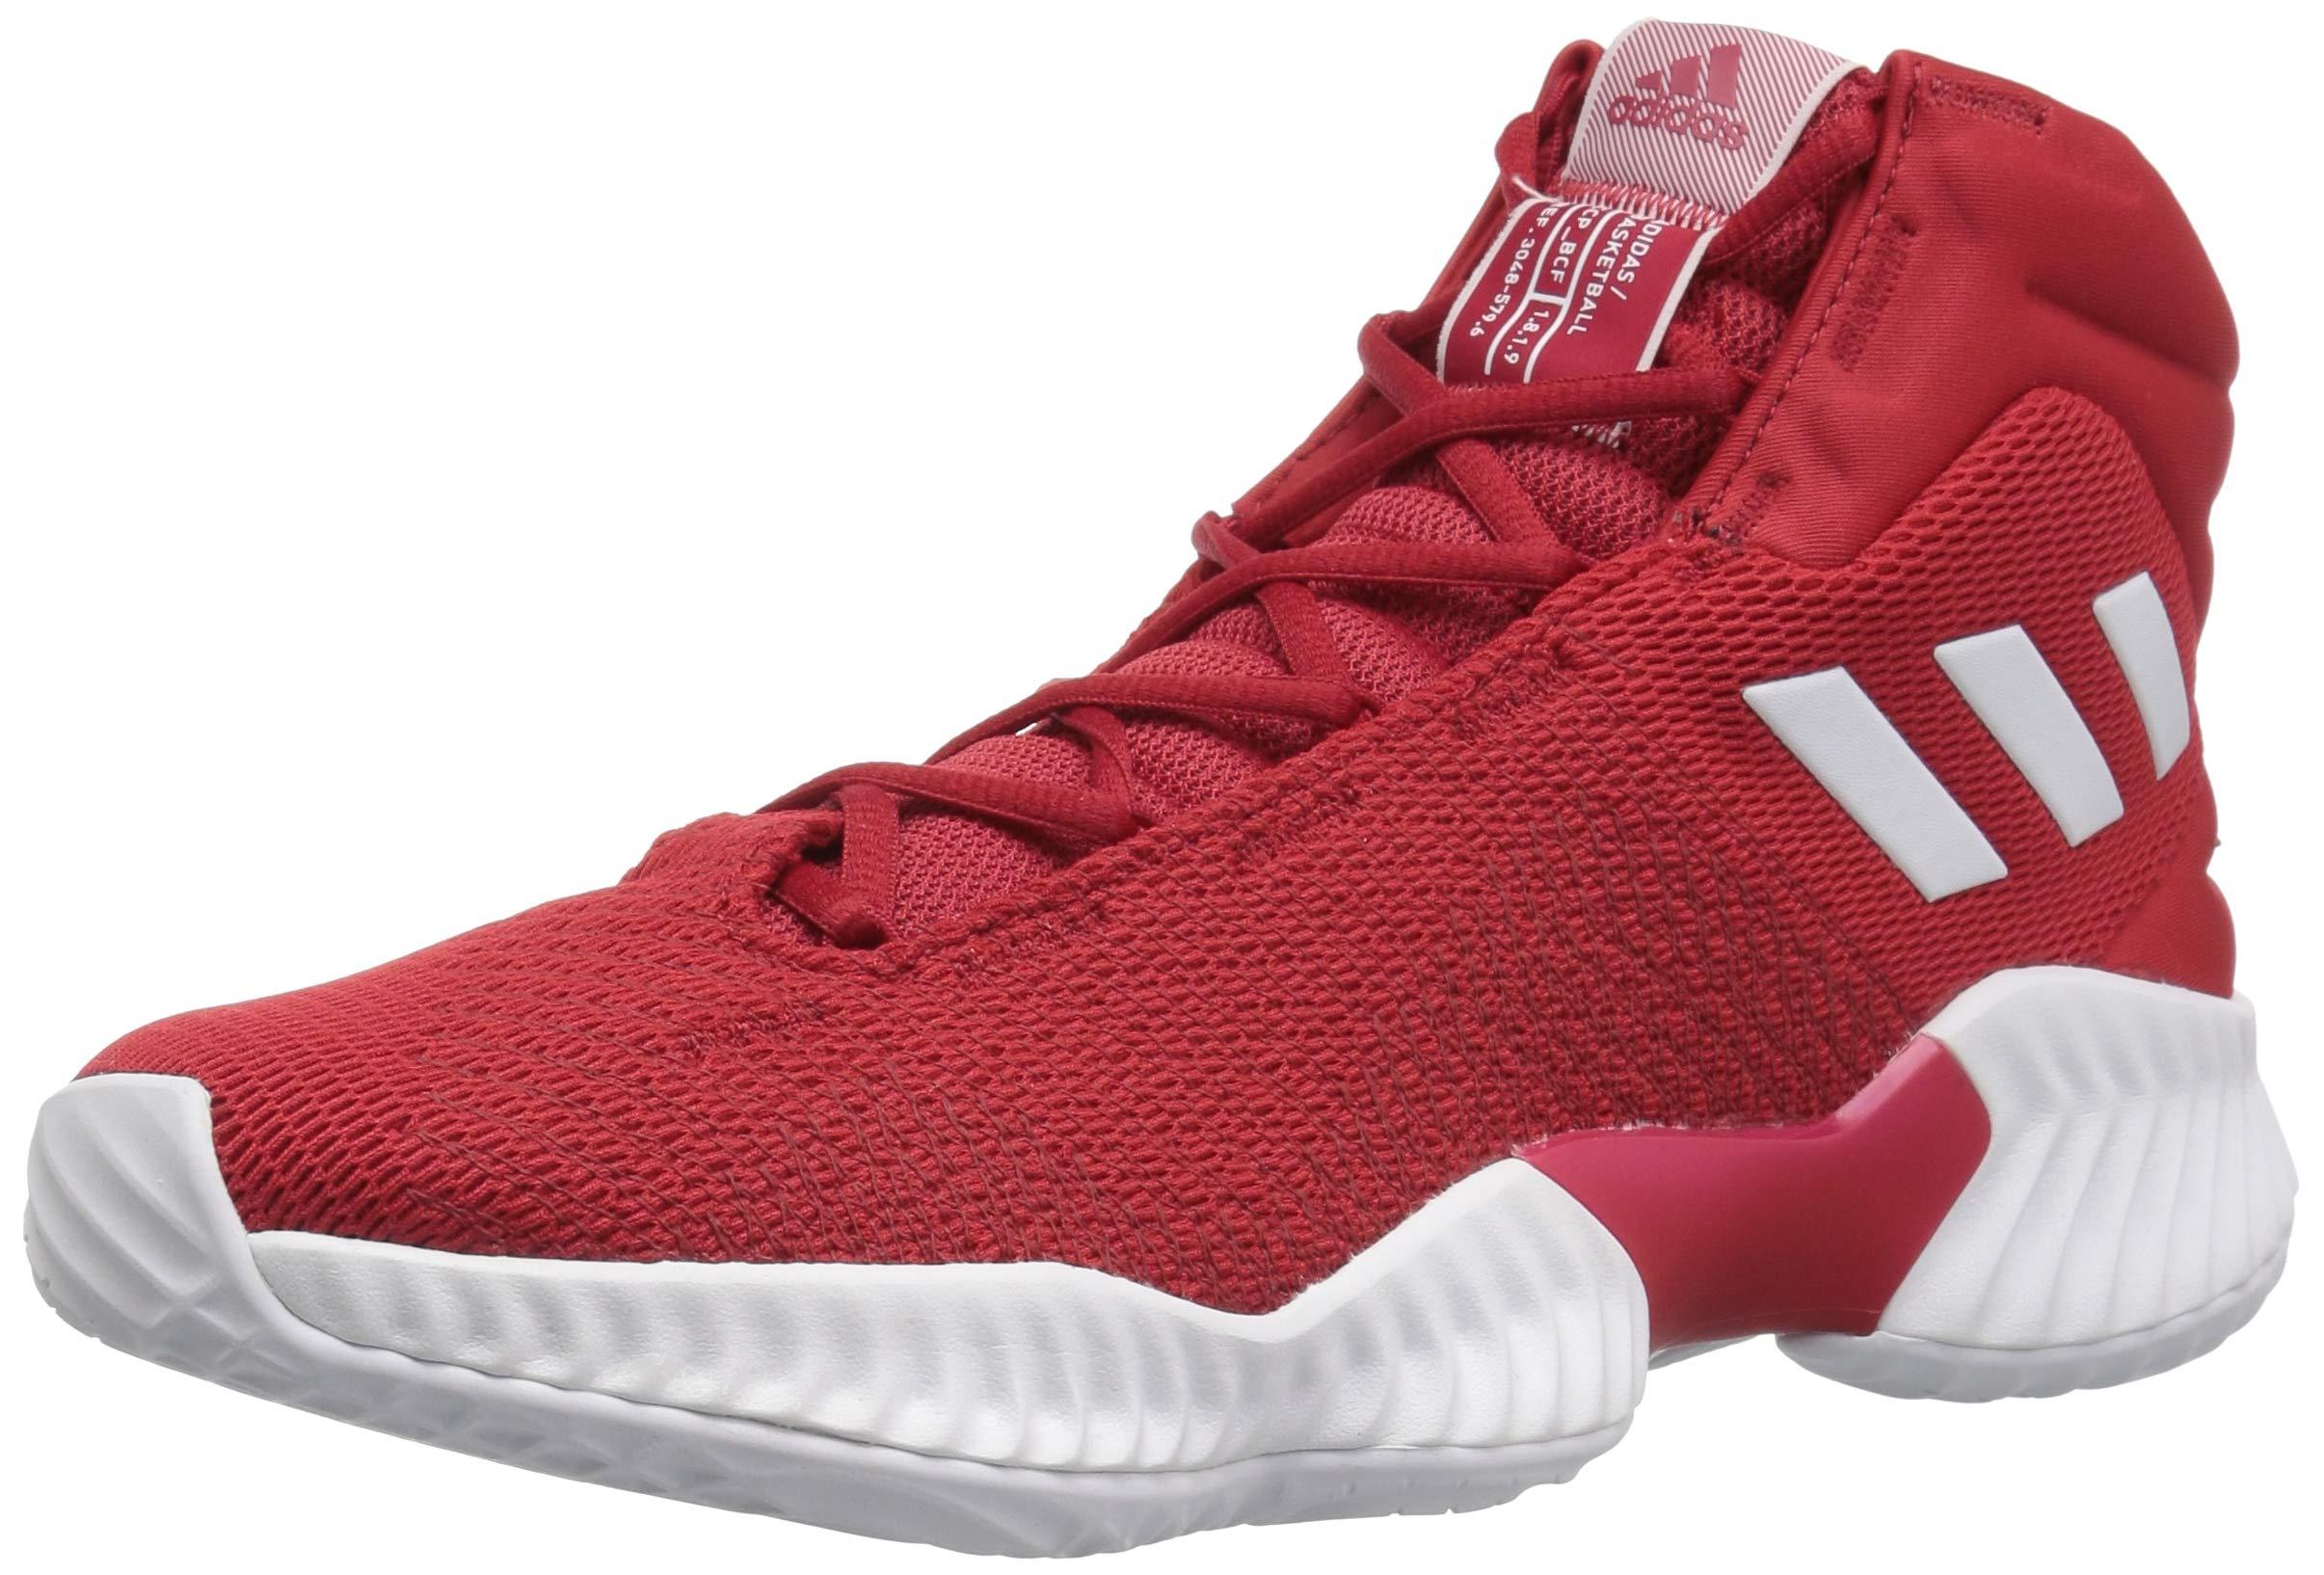 33cb478d5 Galleon - Adidas Men s Pro Bounce 2018 Basketball Shoe